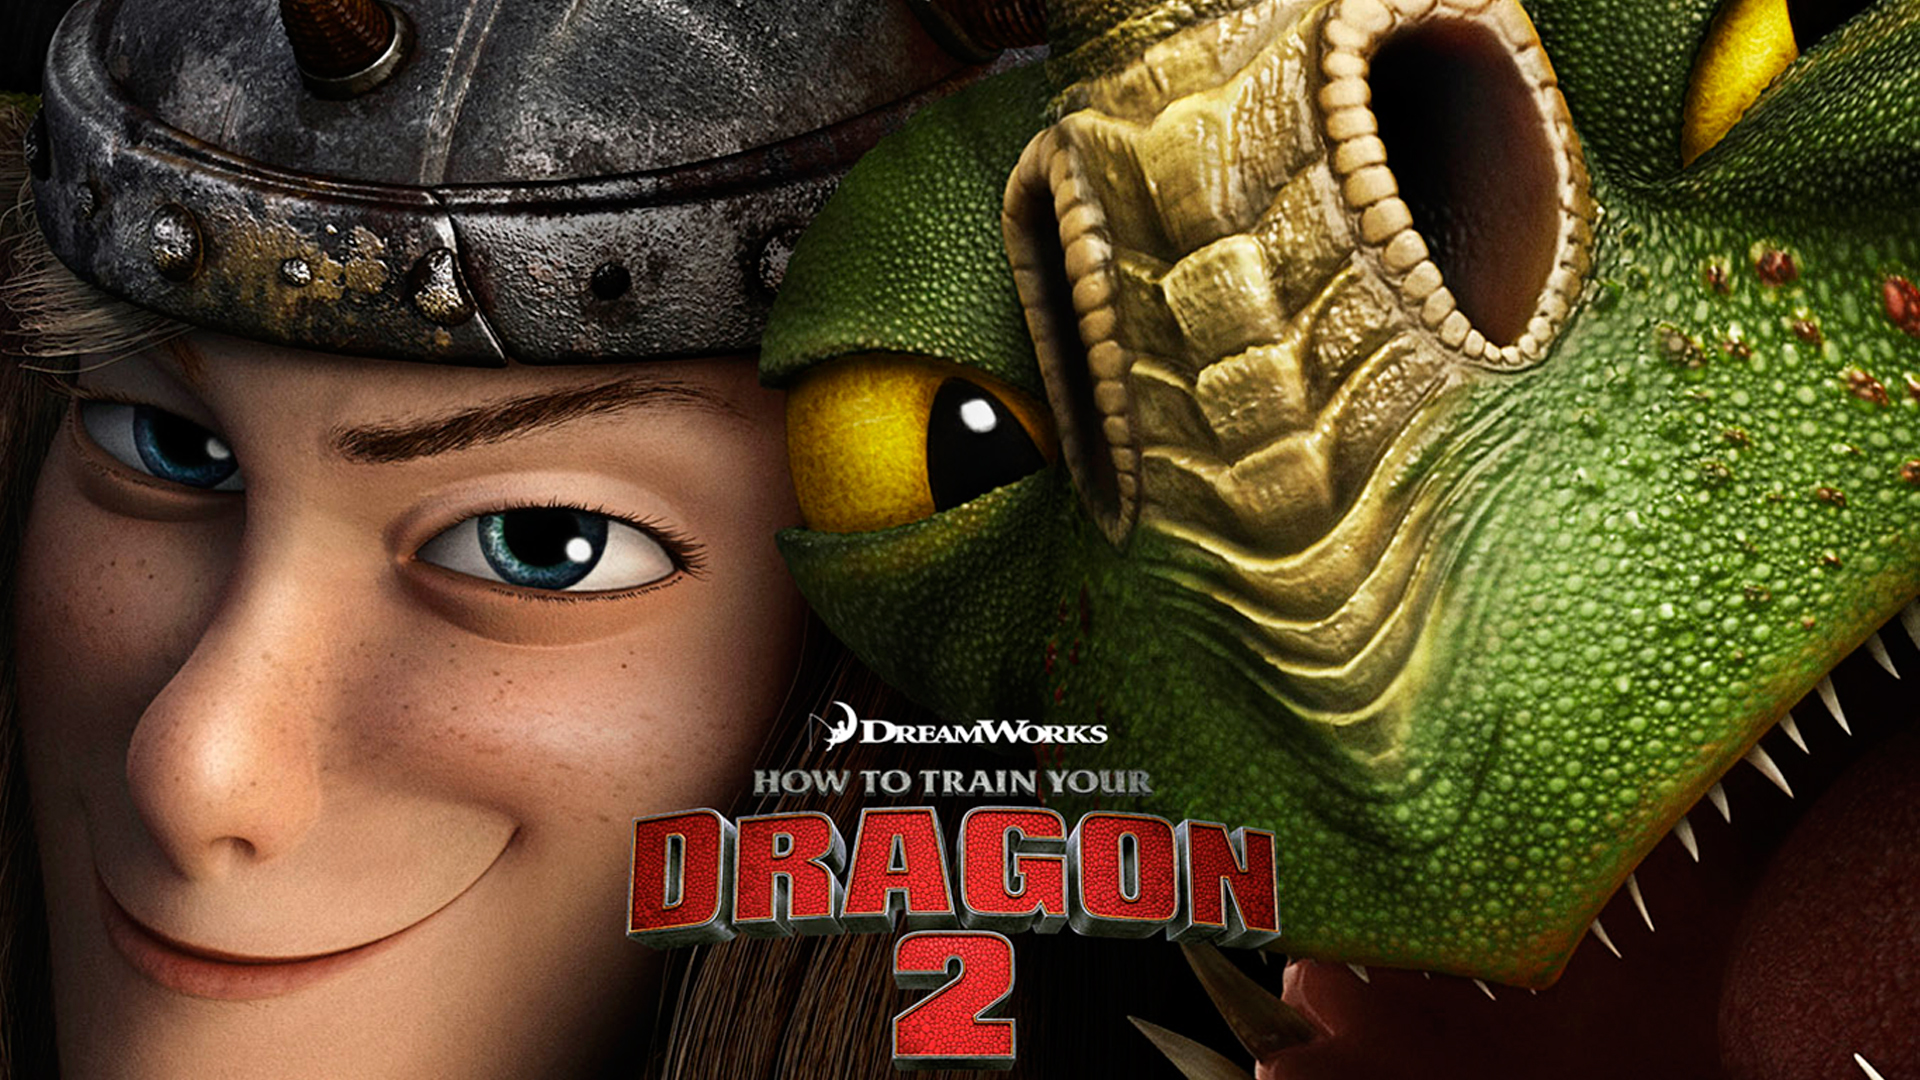 Ruffnut How to Train Your Dragon 2 0j Wallpaper HD